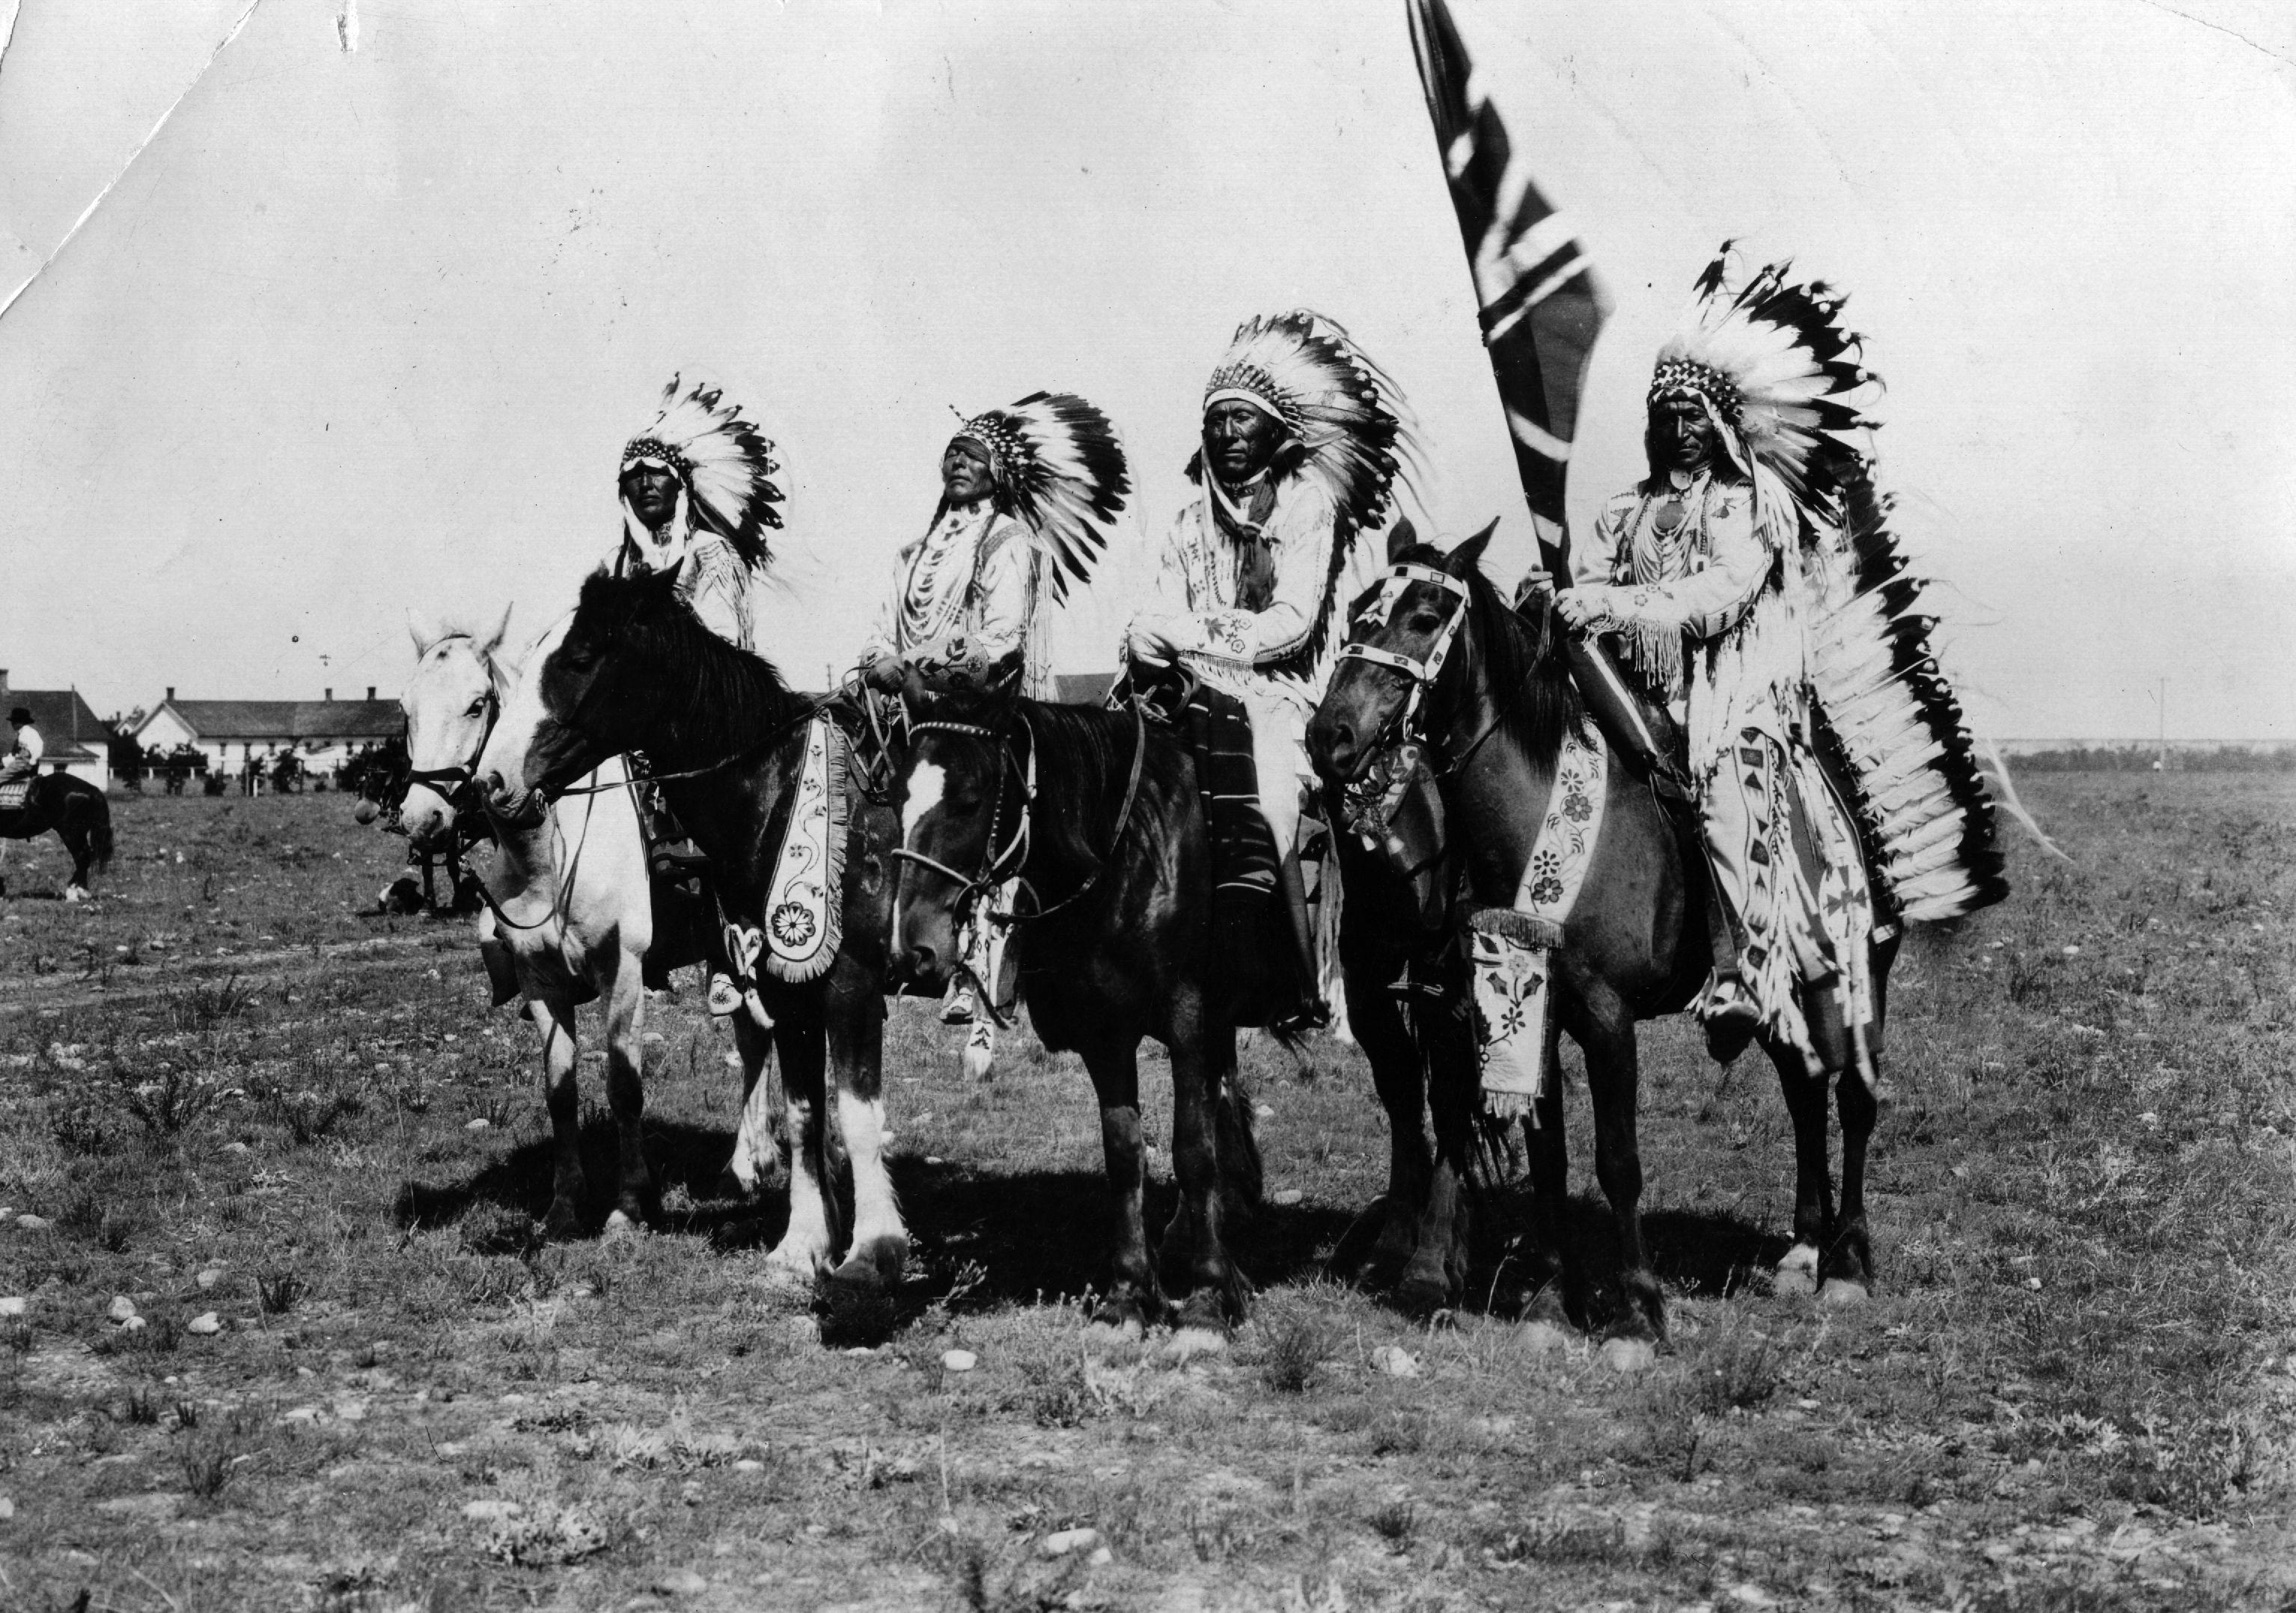 Native chiefs on horseback, wearing long, feathered headdresses.